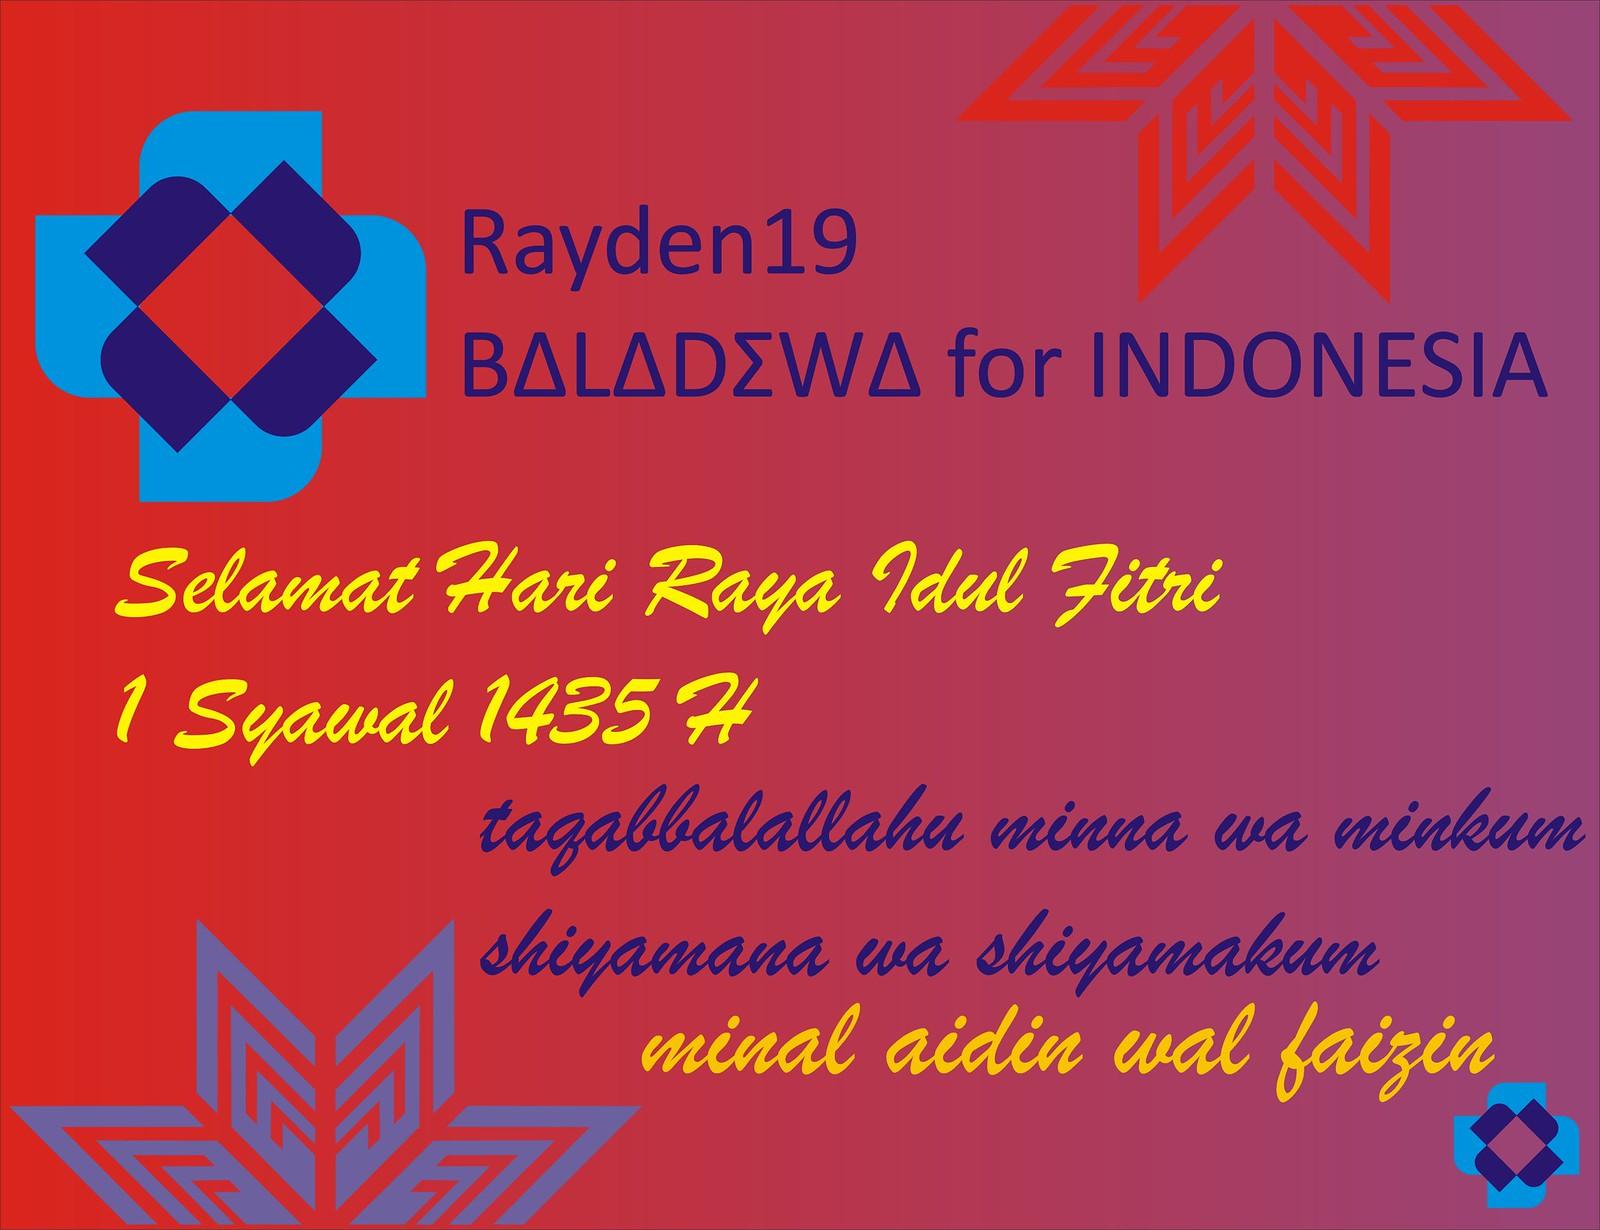 rayden19 idul fitri 1435 h